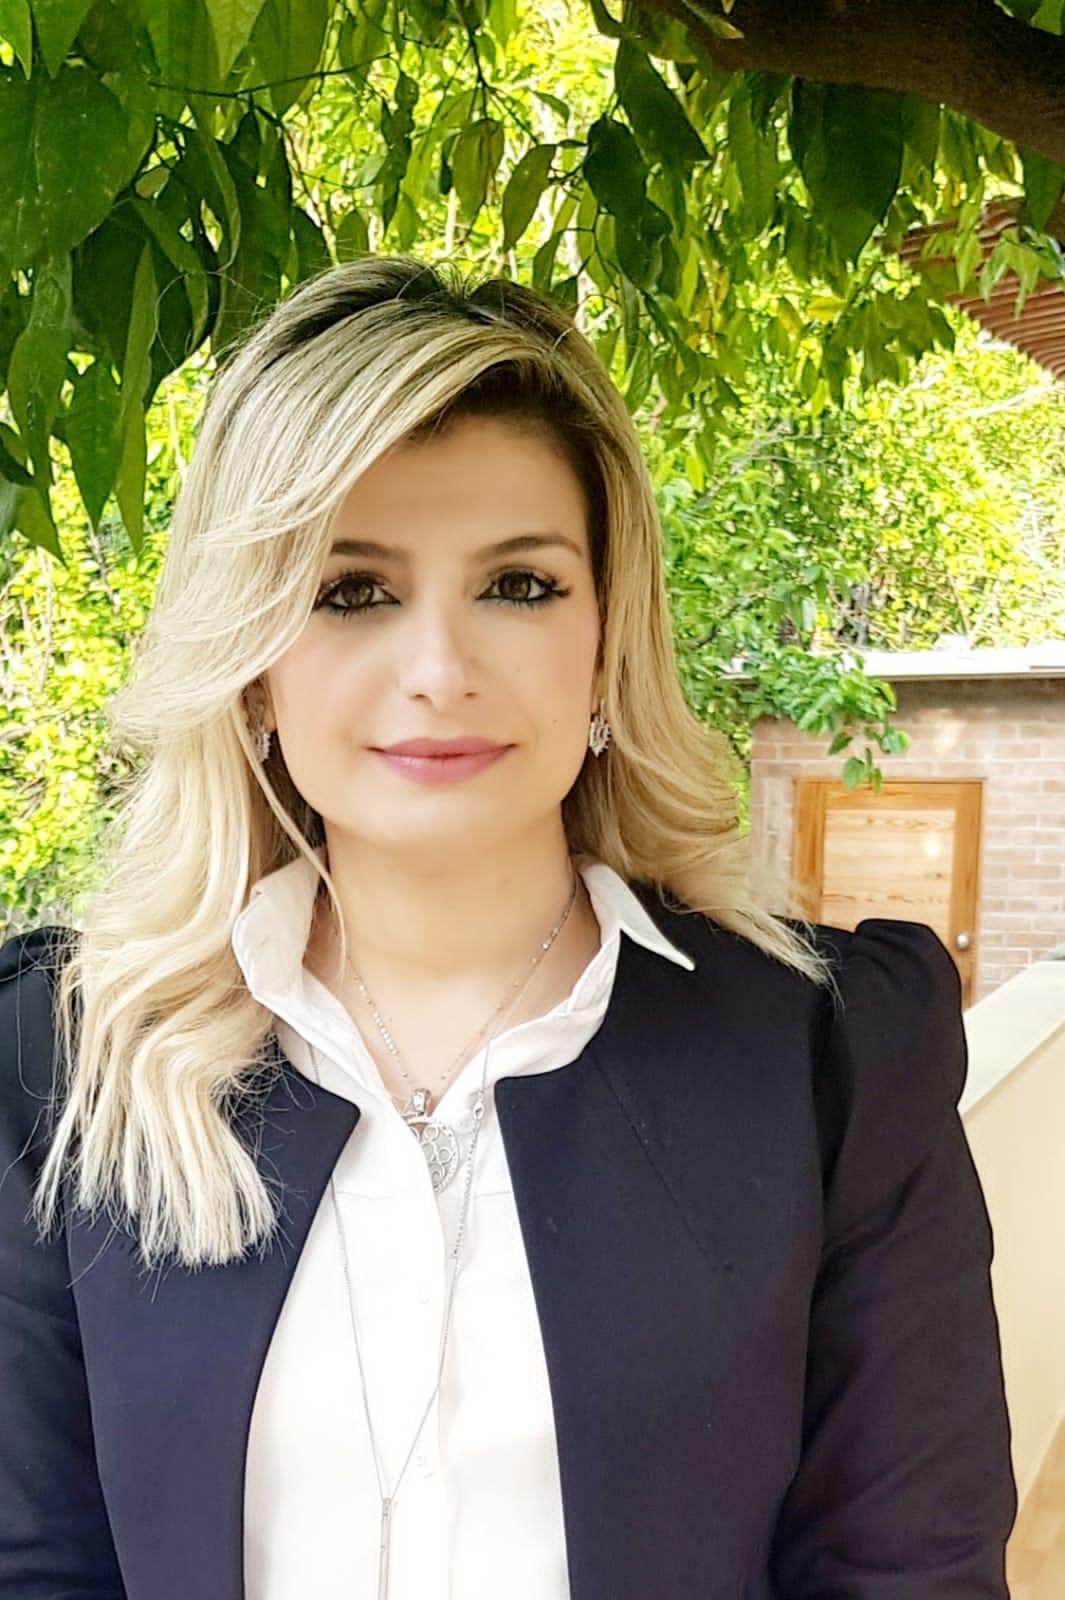 Nutritionist Myrna El Lafta